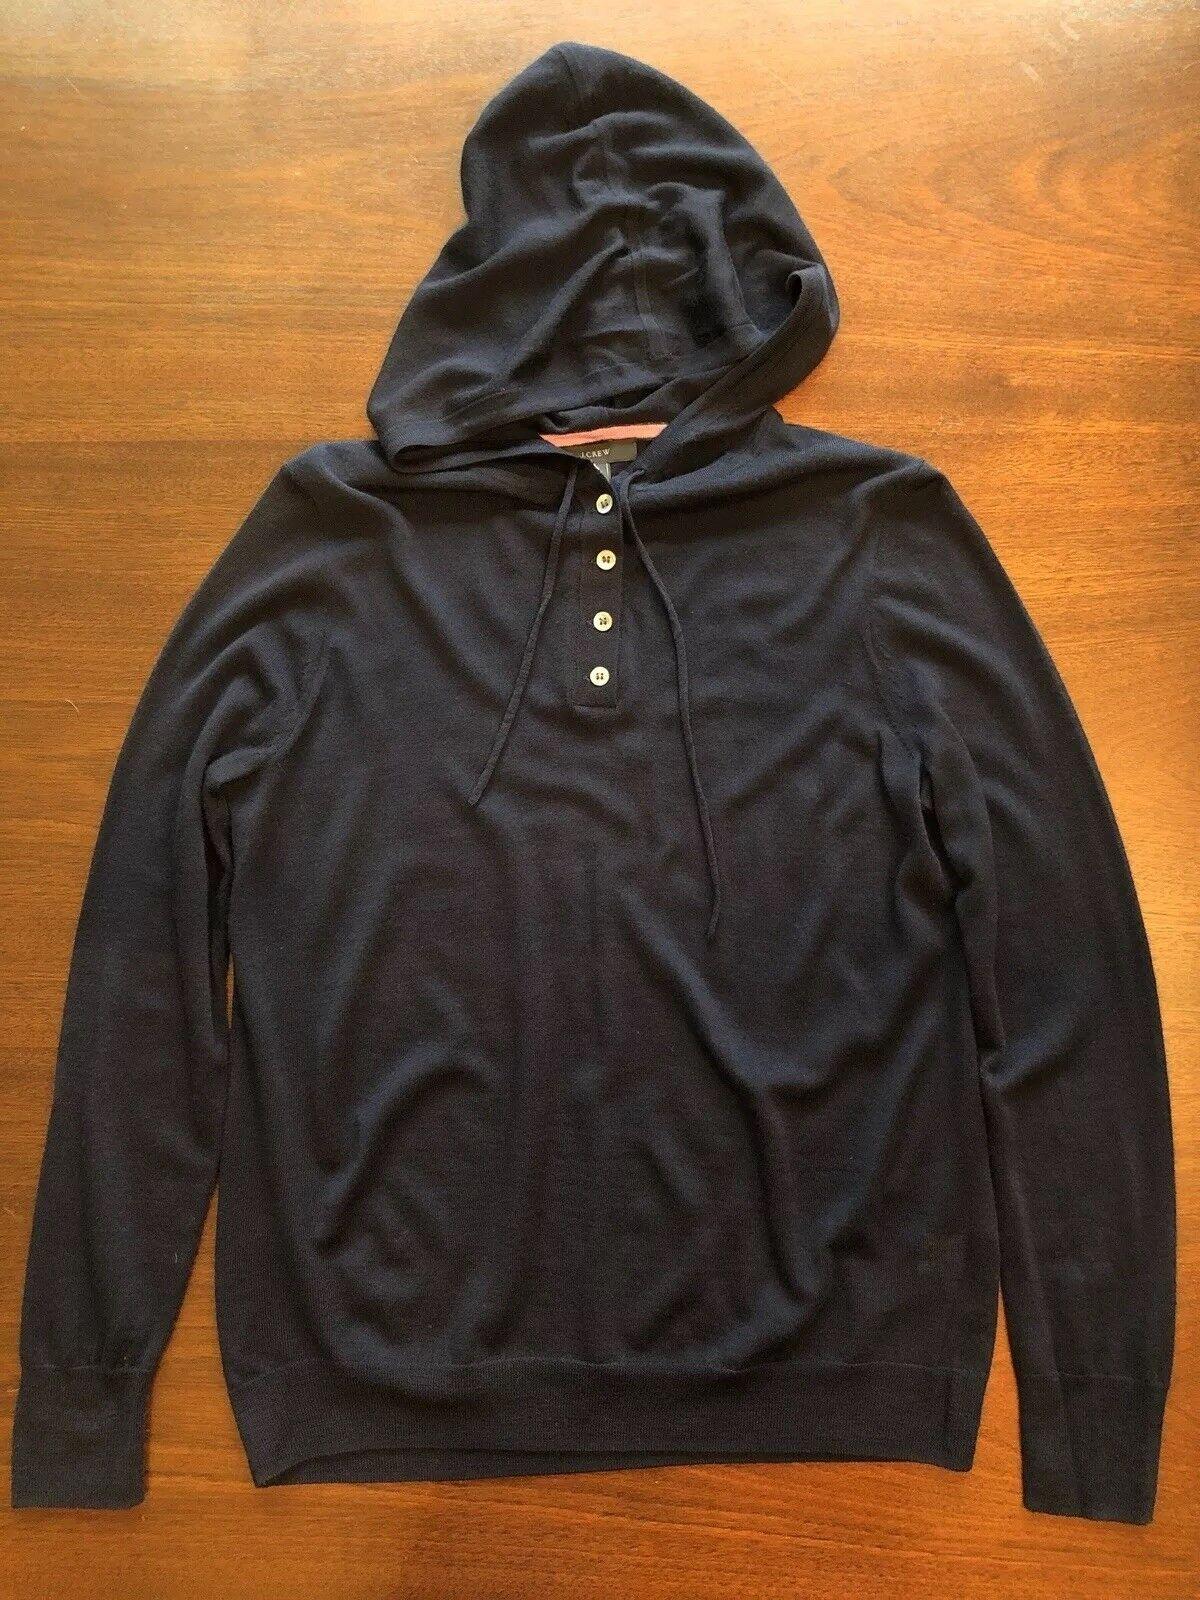 NWT NWT NWT Jcrew Lightweight merino wool henley hoodie Sweater Long Sleeve Navy Sz S 3c19ff